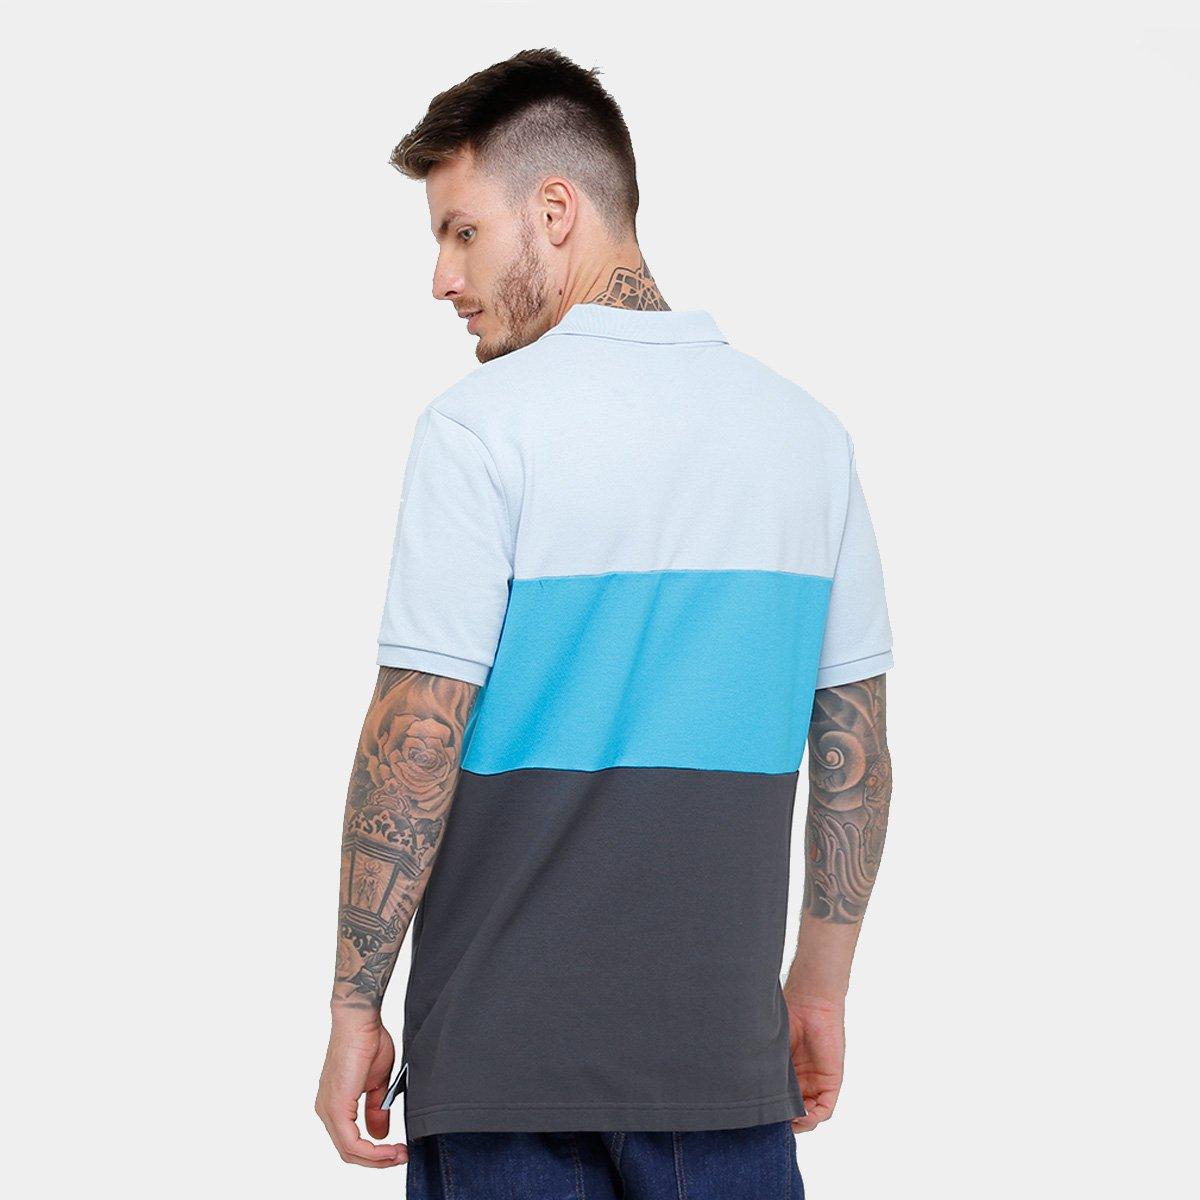 Camisa Polo Nike Nsw Pq Matchup Clrblk Masculina - Compre Agora ... 430b83bfaa113